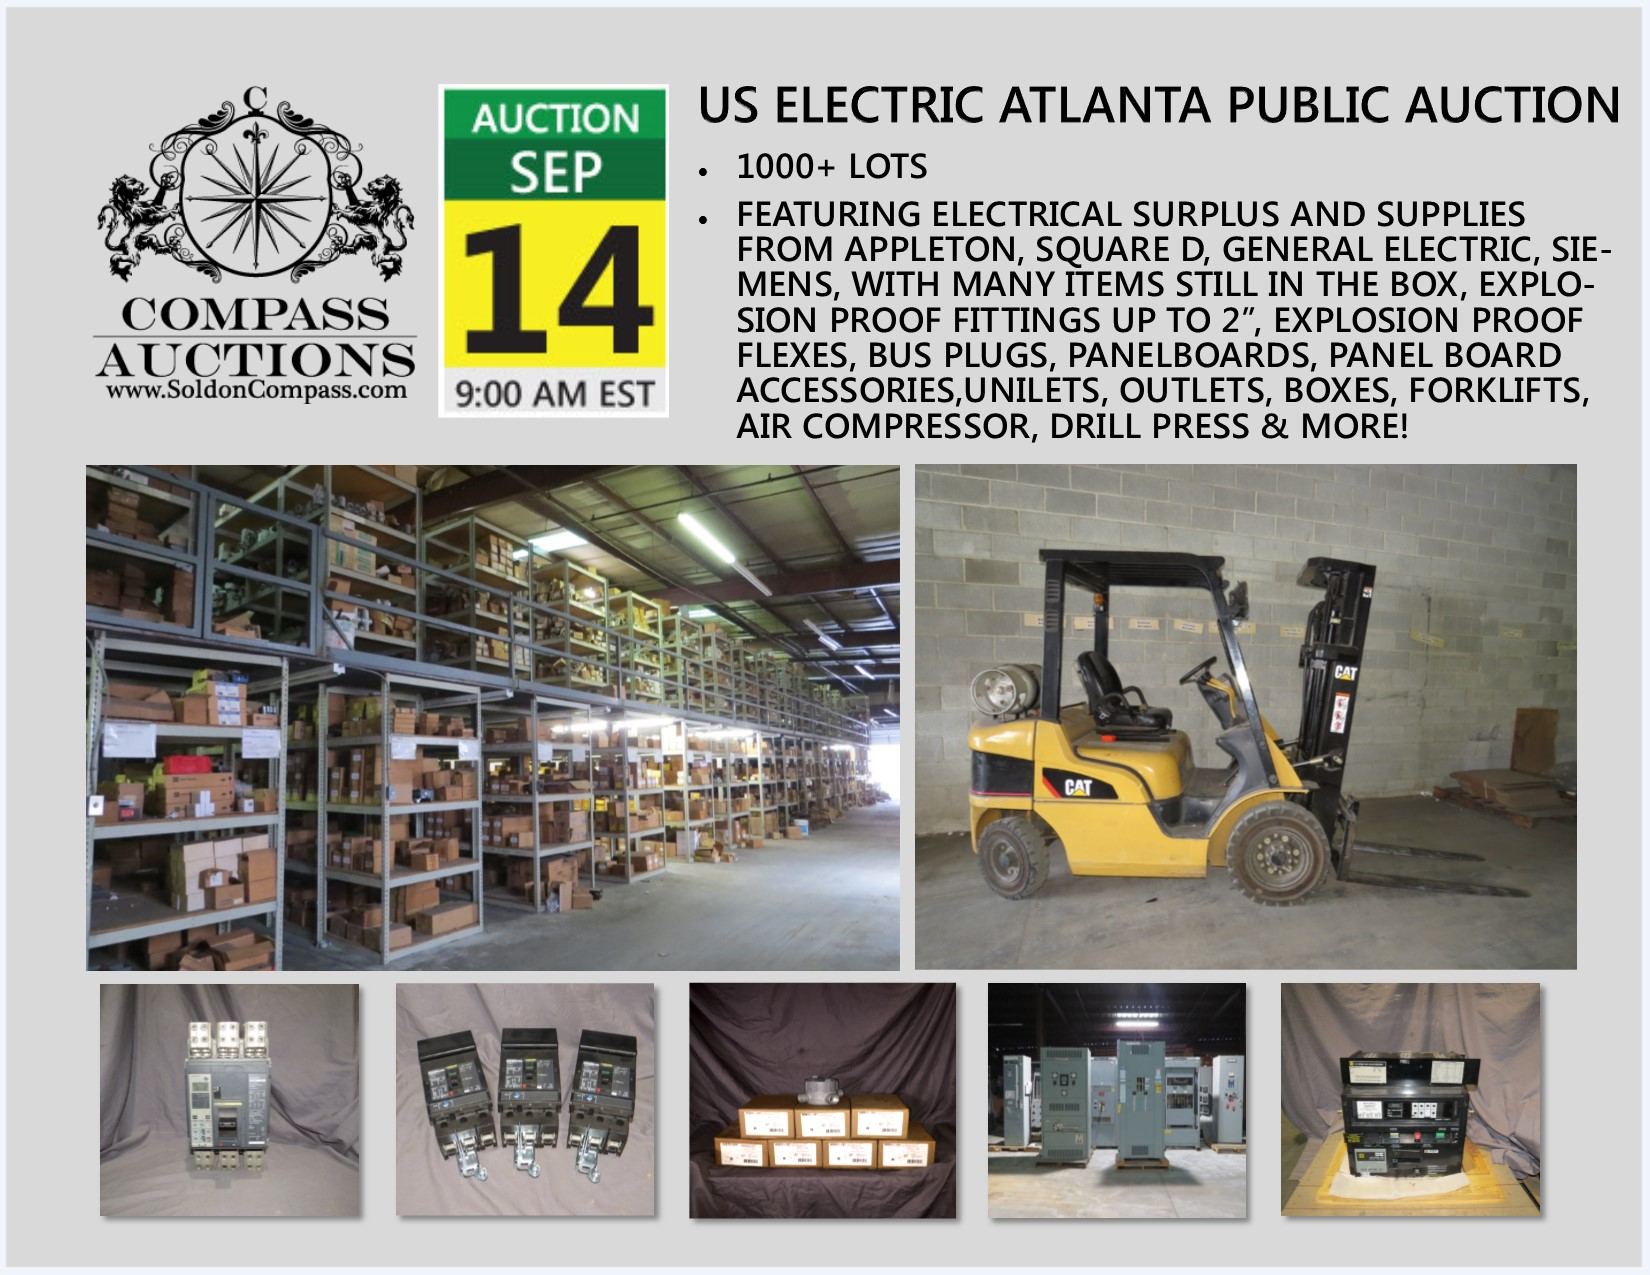 US Electric Atlanta Public Auction September 14 2017